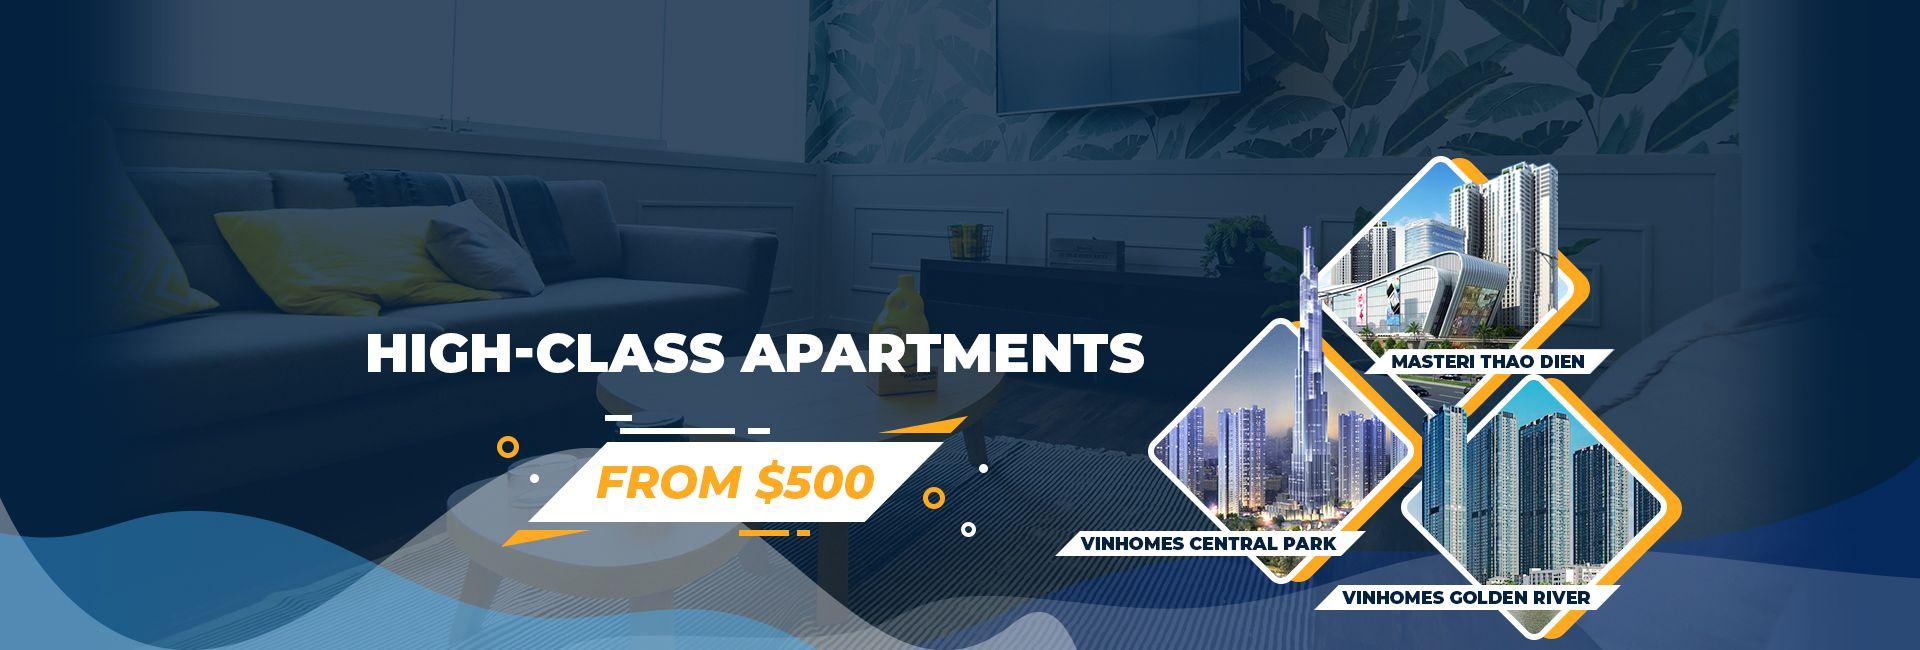 Banner High-class apartments